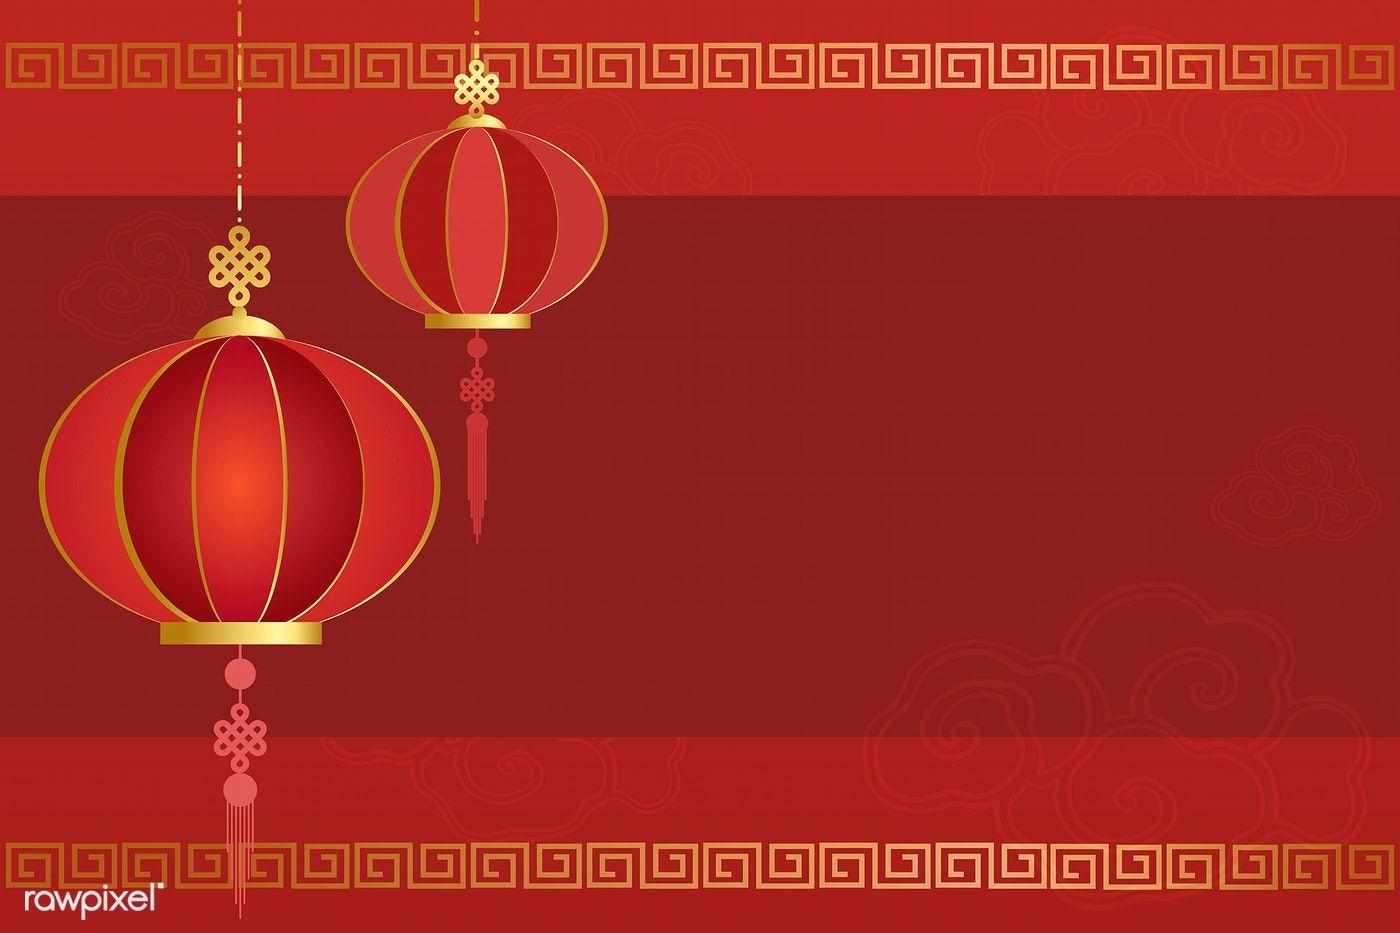 Chinese New Year 2019 Greeting Background Free Image By Rawpixel Com Kappy Kappy Chinese Background Vector Free Chinese New Year Greeting